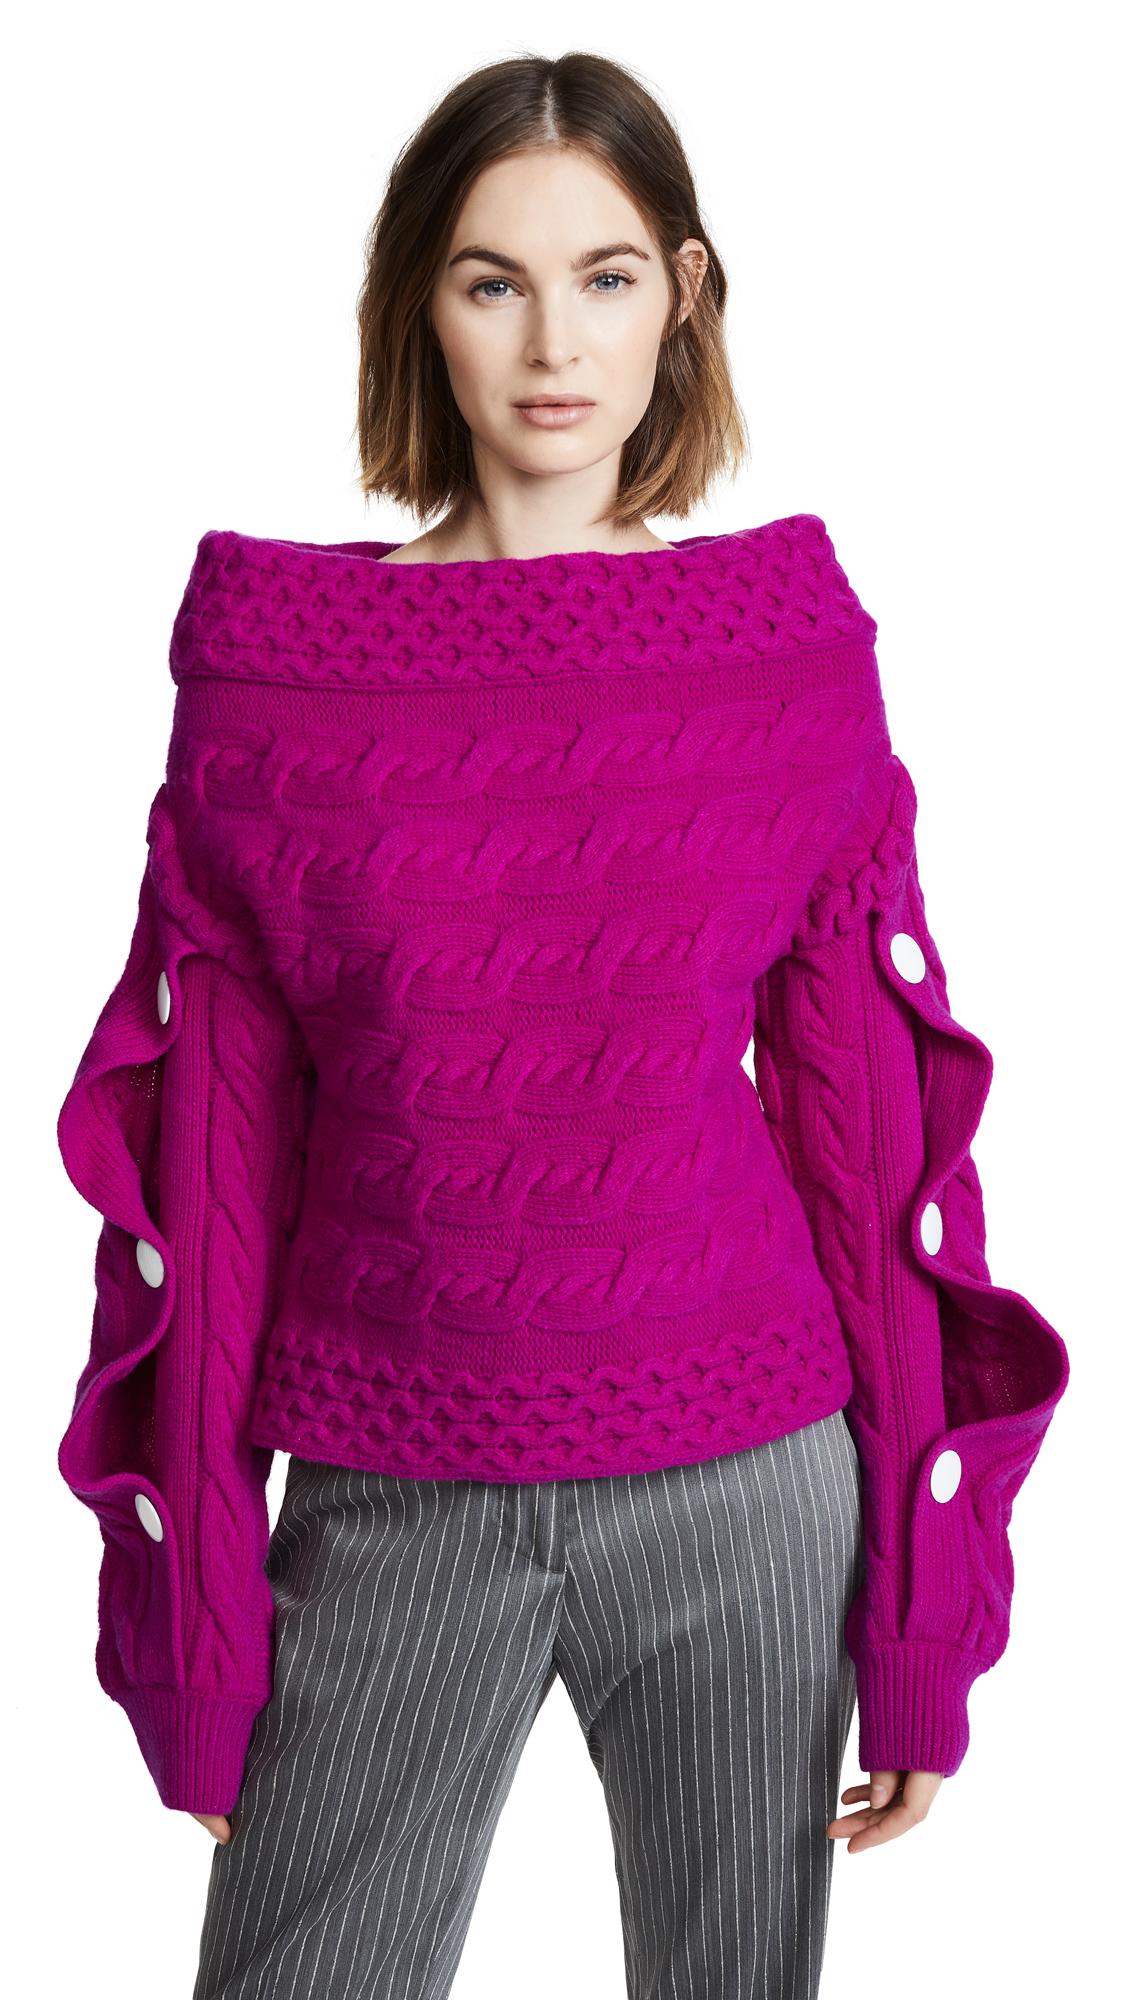 HELLESSY Dorian Sweater in Fuschia